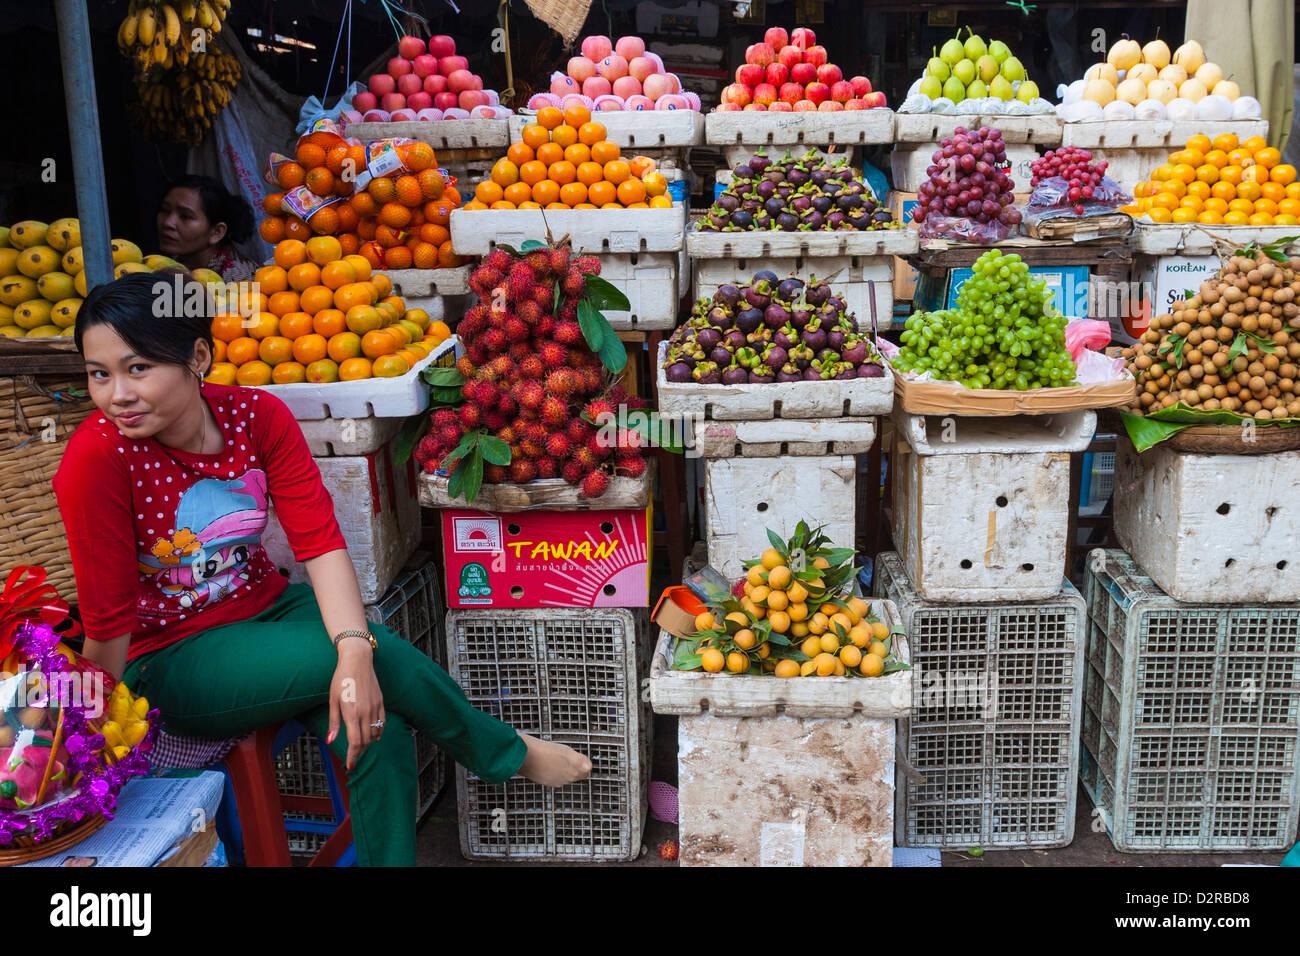 Fruit store, Central Market, Phnom Penh, Cambodia, Indochina, Southeast Asia, Asia - Stock Image